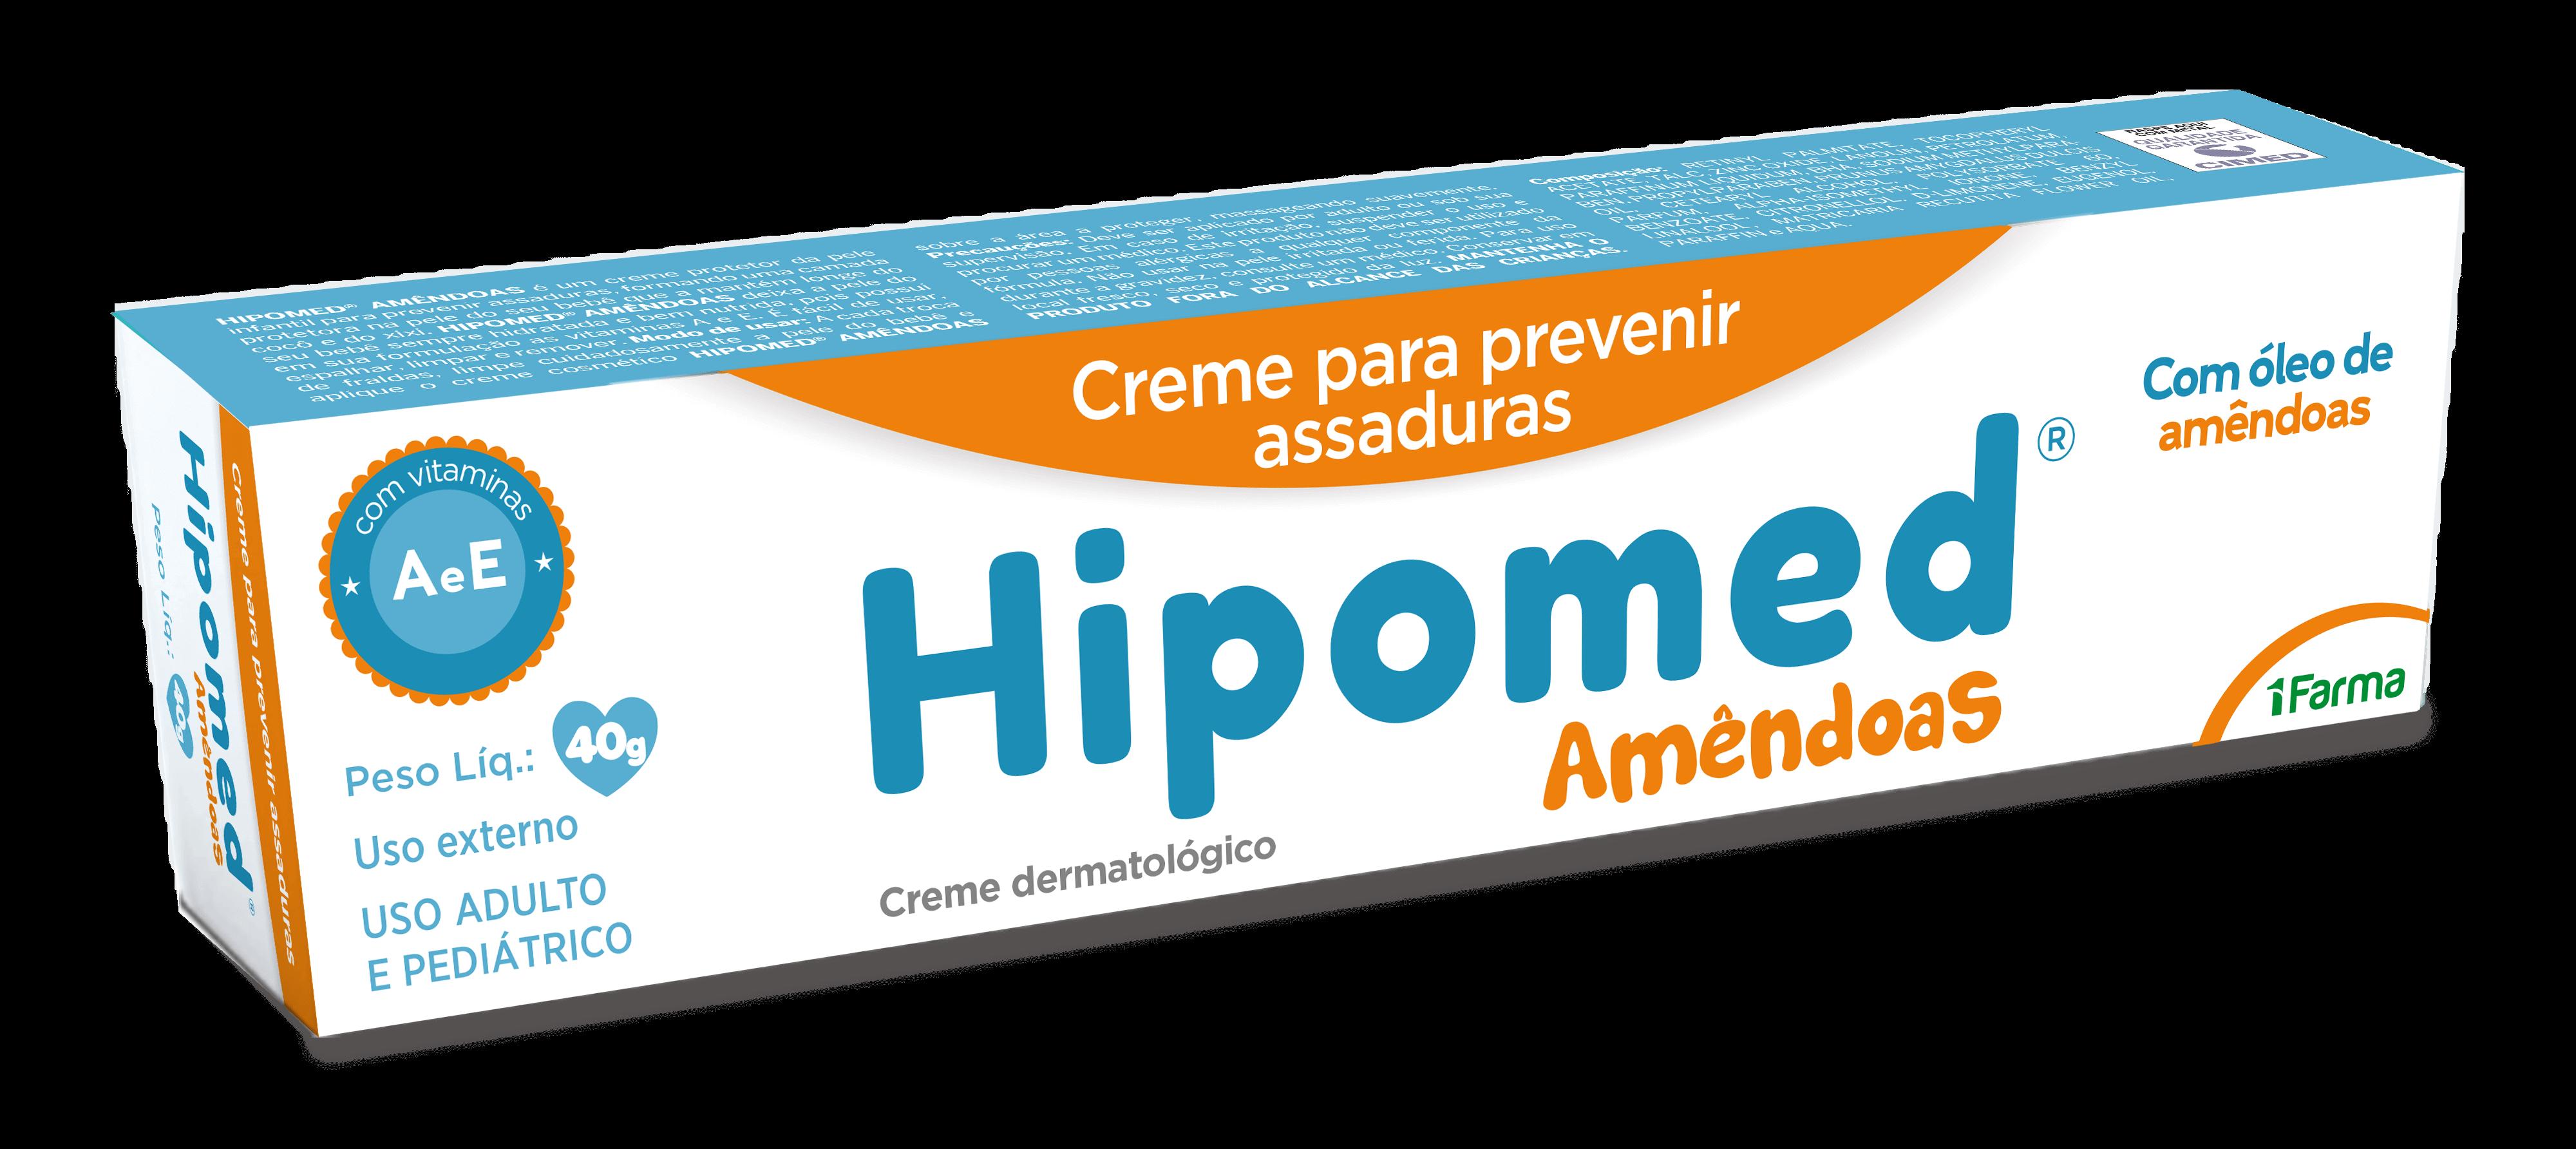 Imagem da embalagem do Hipomed Amêndoas.